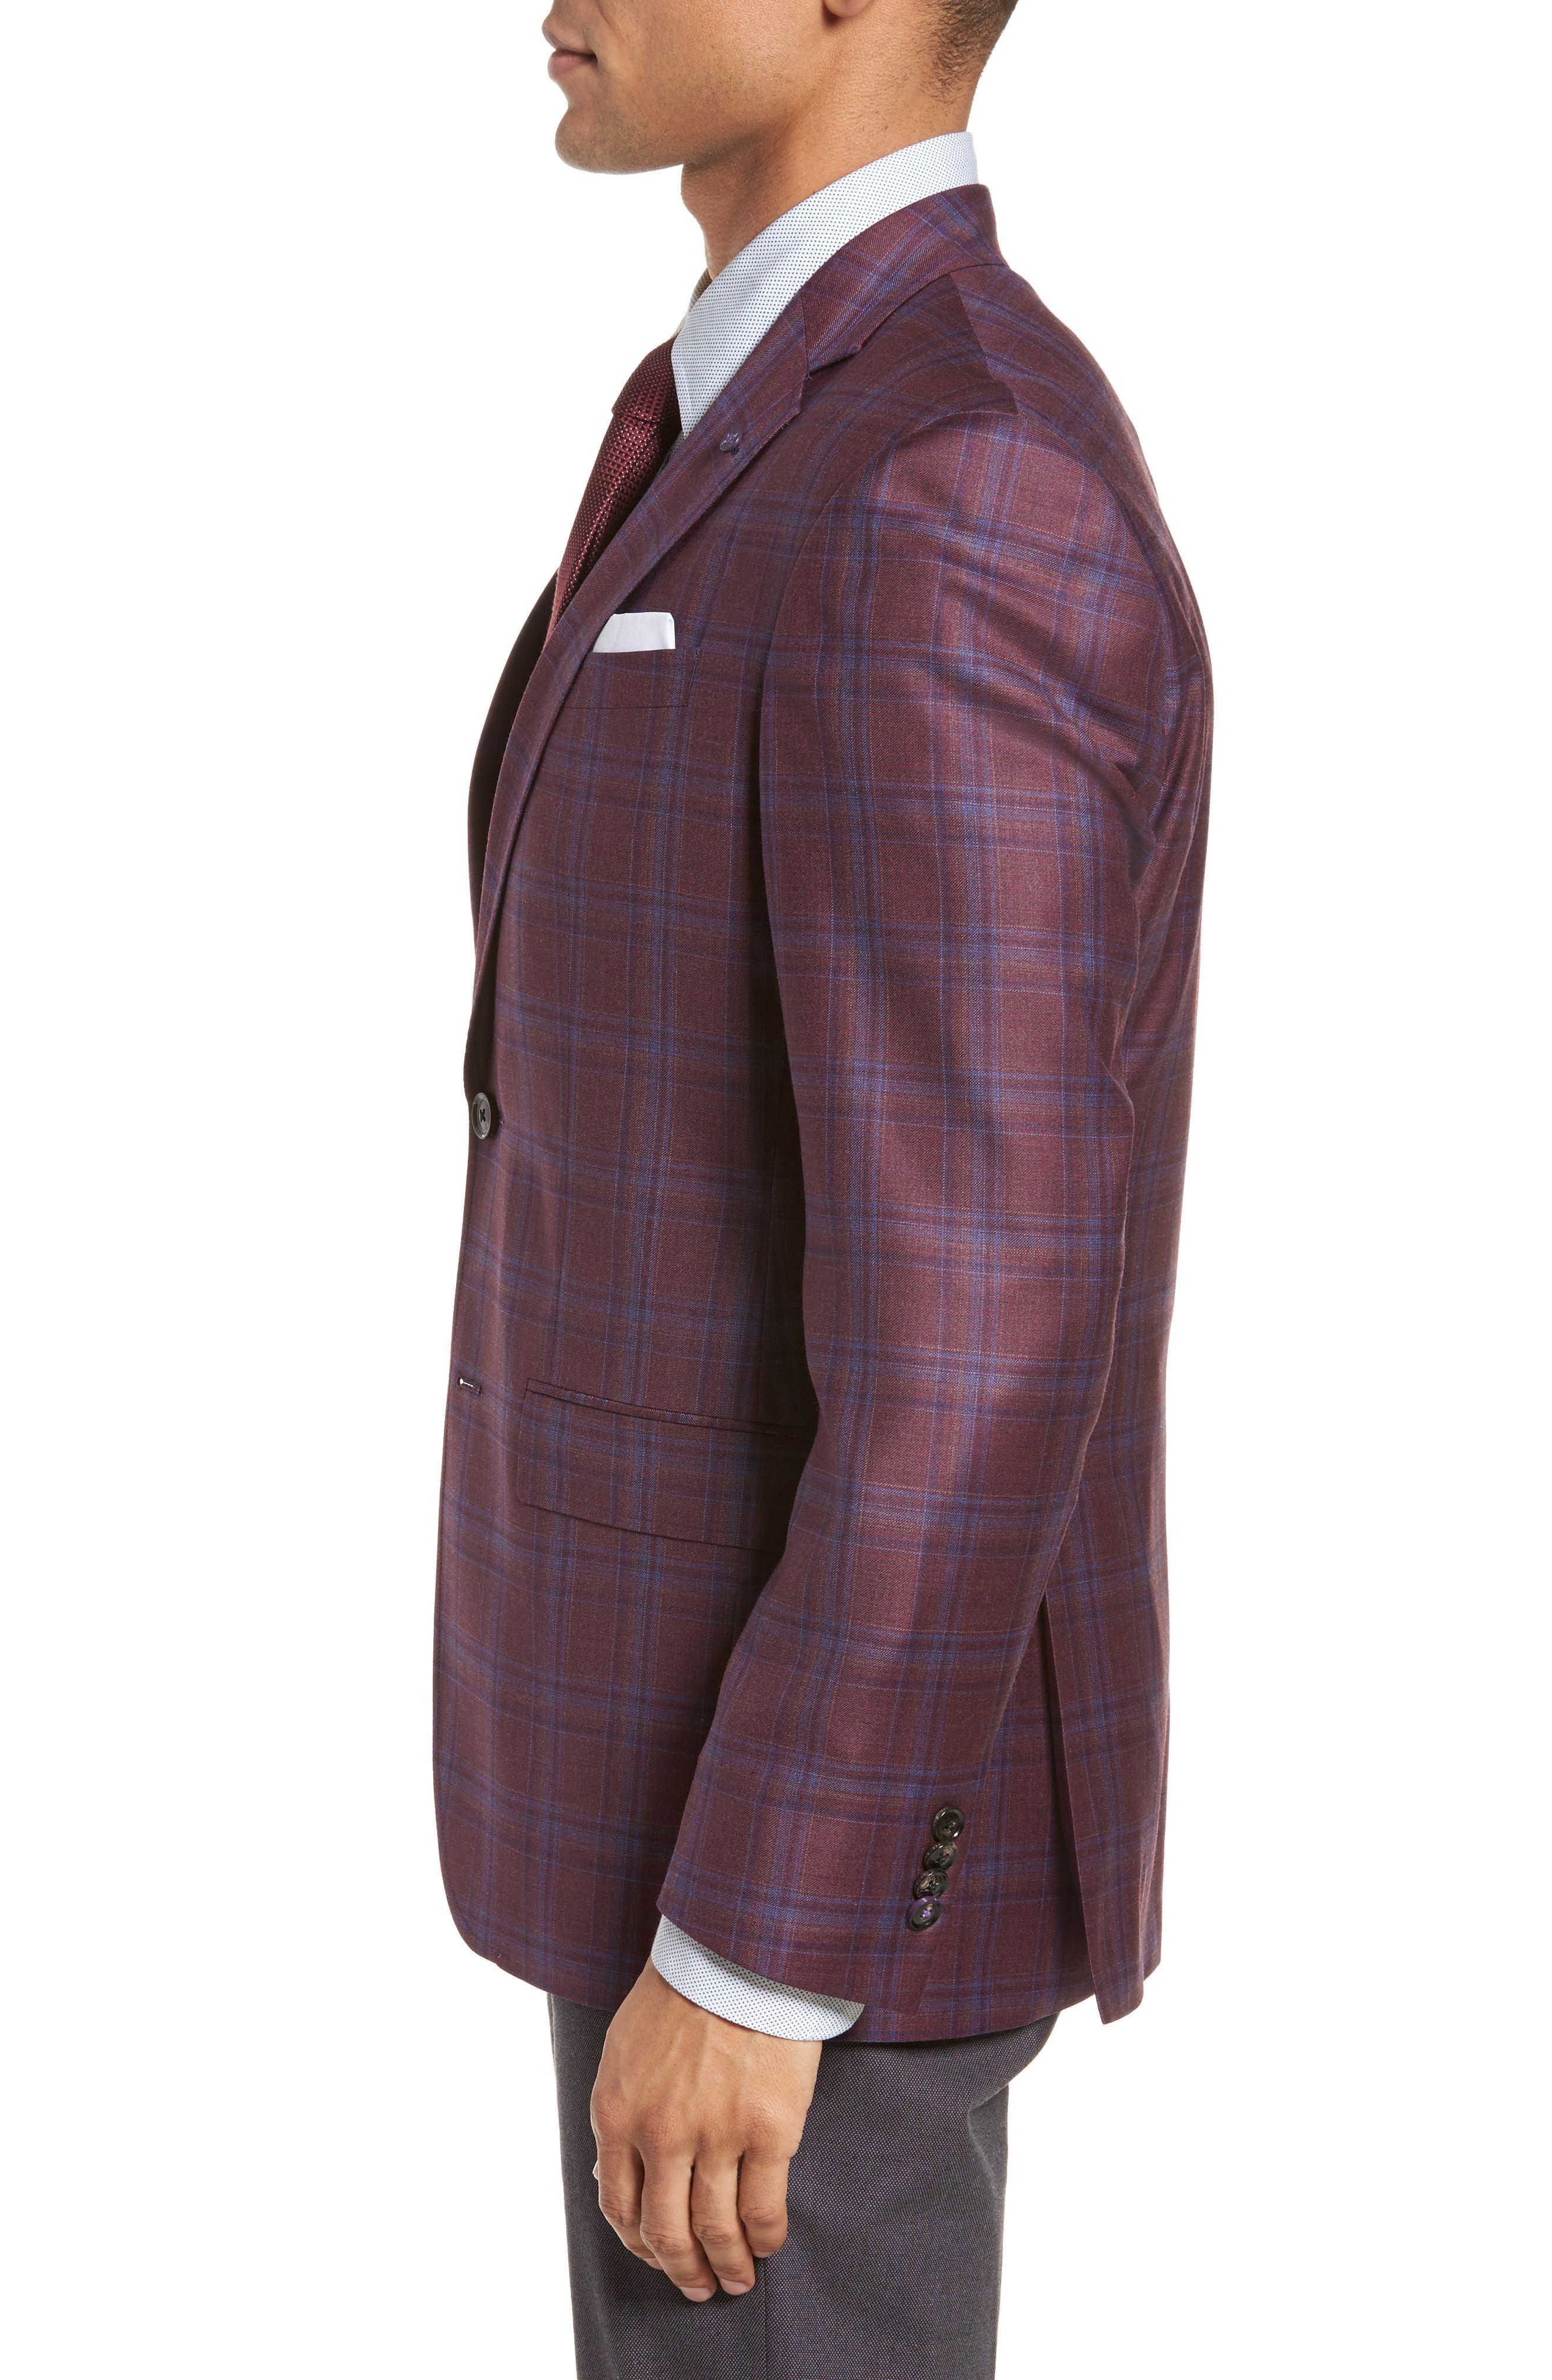 Jay Trim Fit Plaid Wool Sport Coat,                             Alternate thumbnail 3, color,                             600